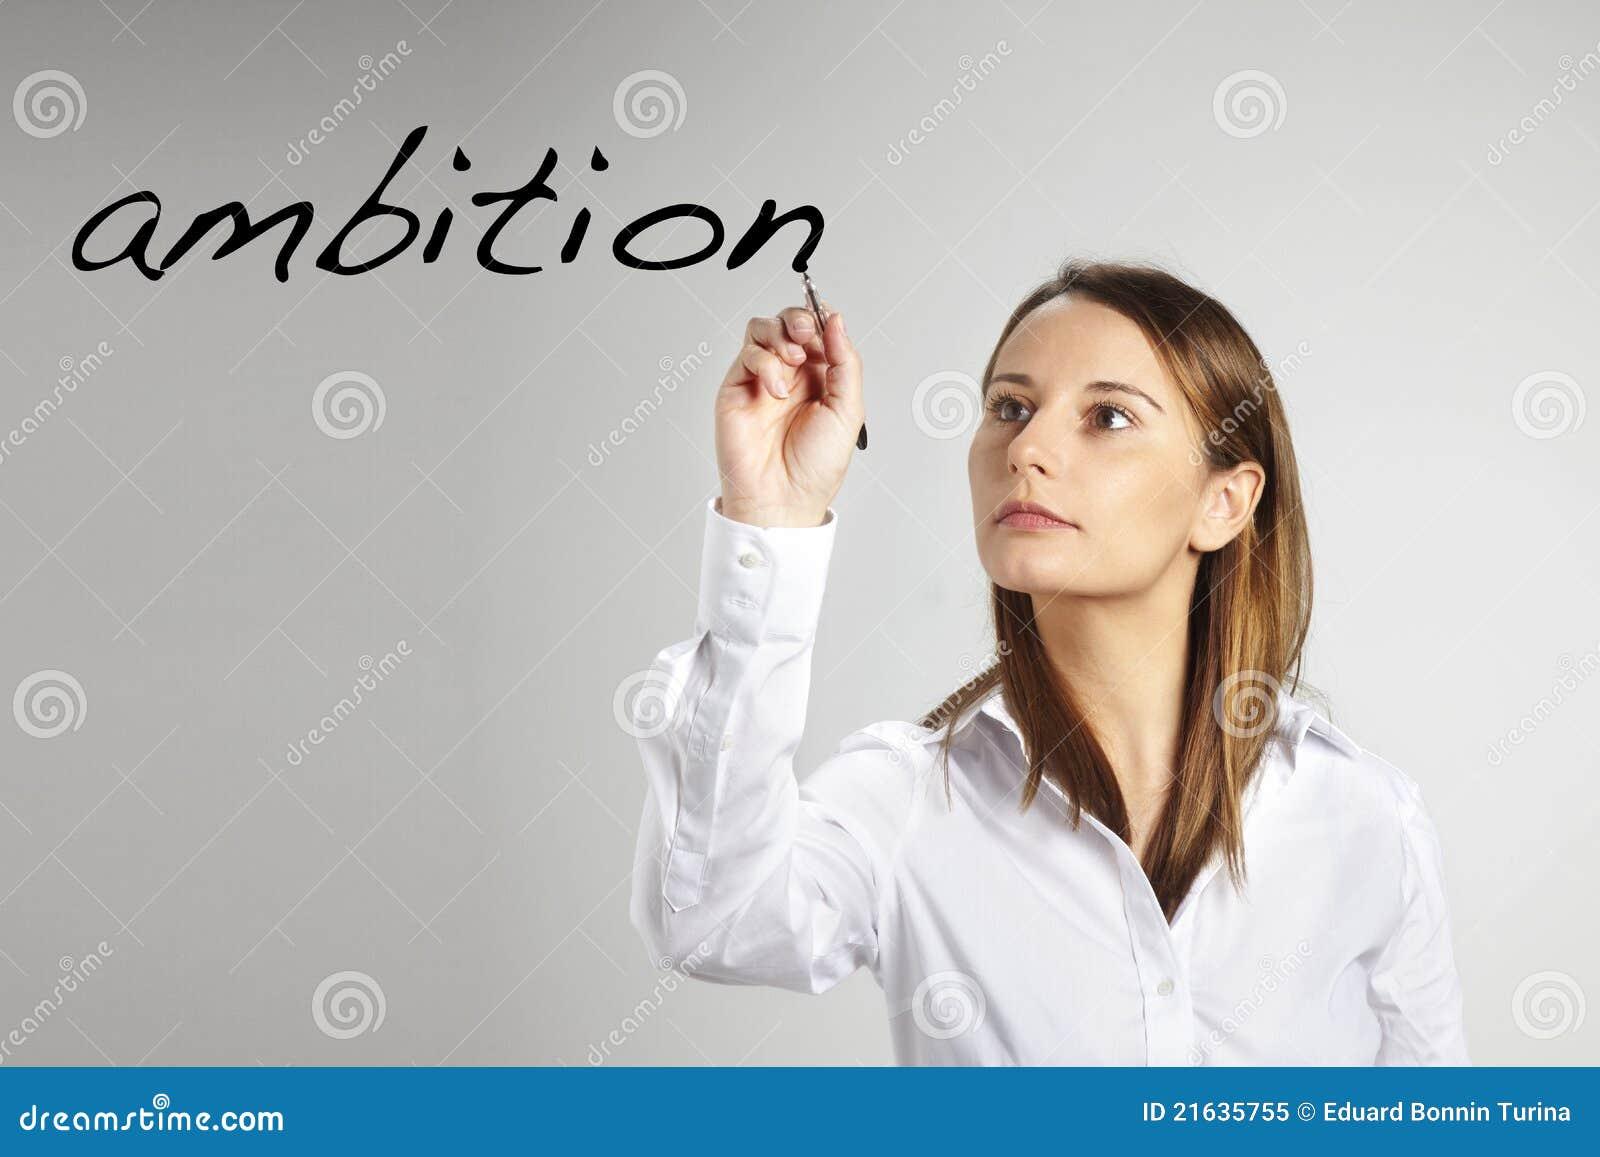 dream ambition essay